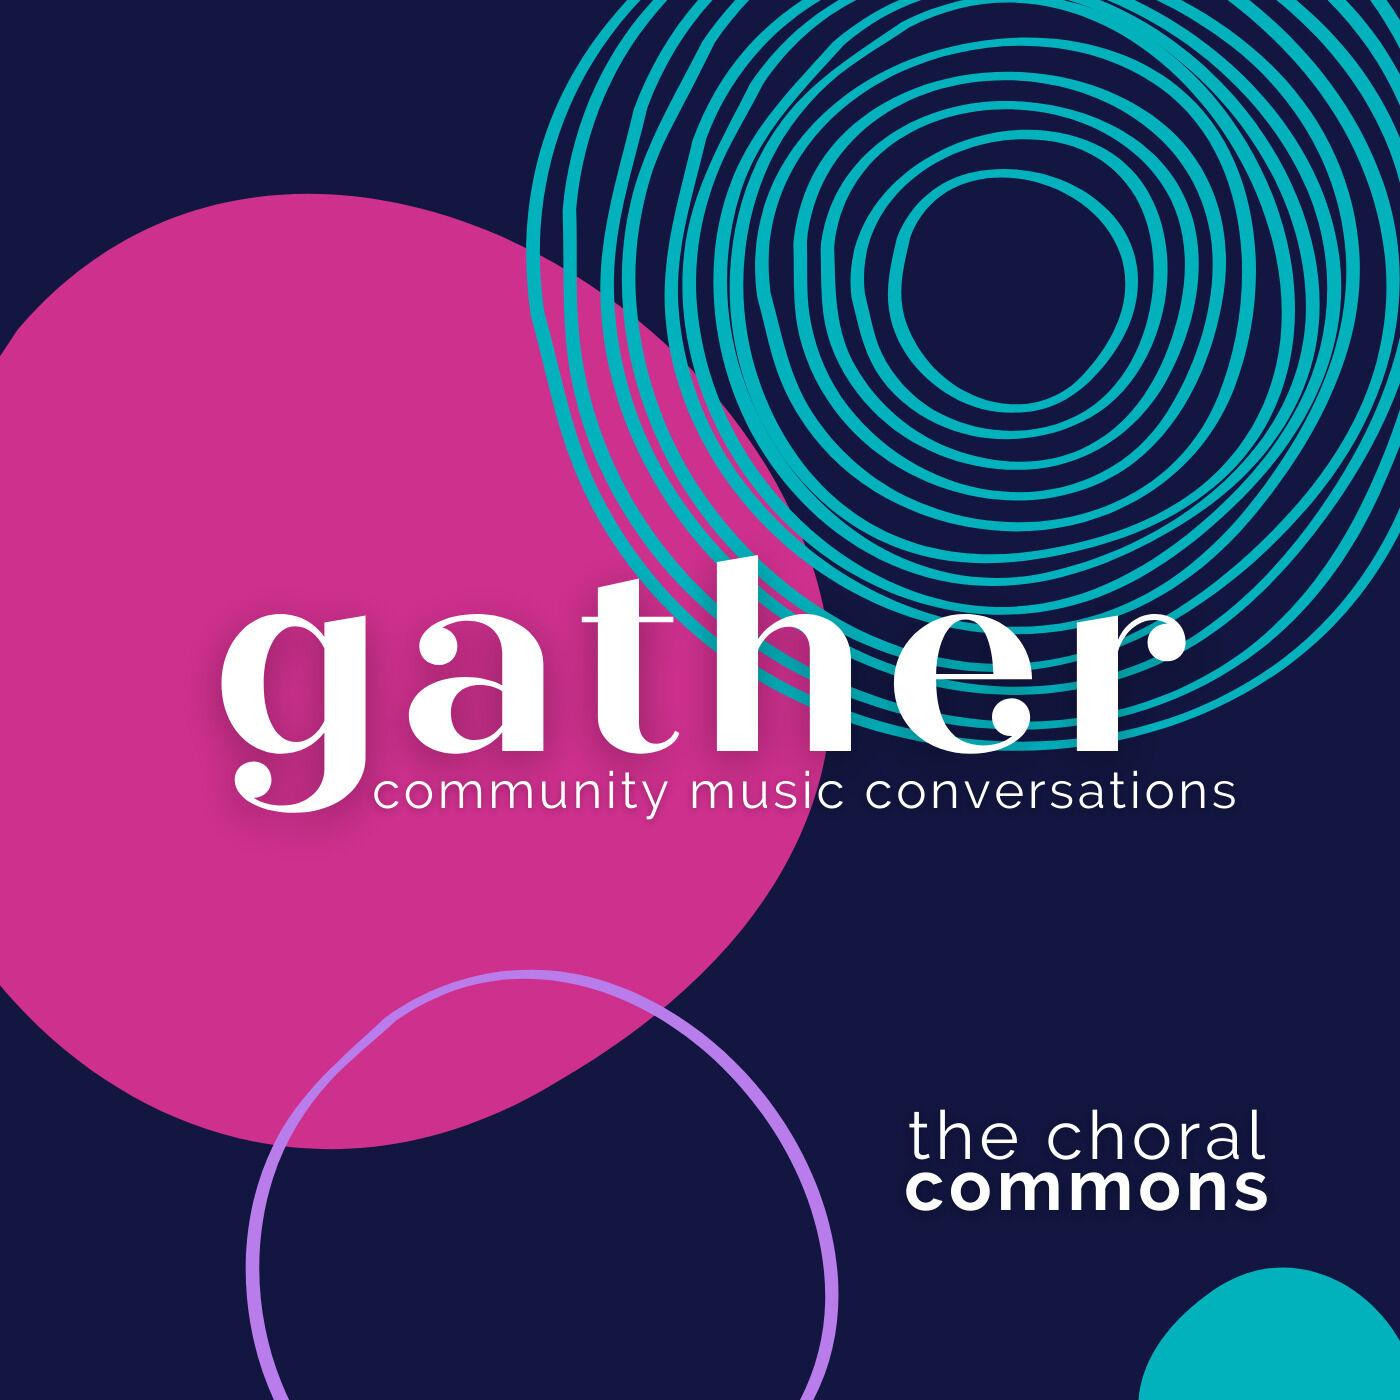 Building the Beloved Community Roundtable // Alexander Lloyd Blake, Arreon Harley-Emerson, Alysia Lee, Zanaida Robles, & Tesfa Wondemagegnehu